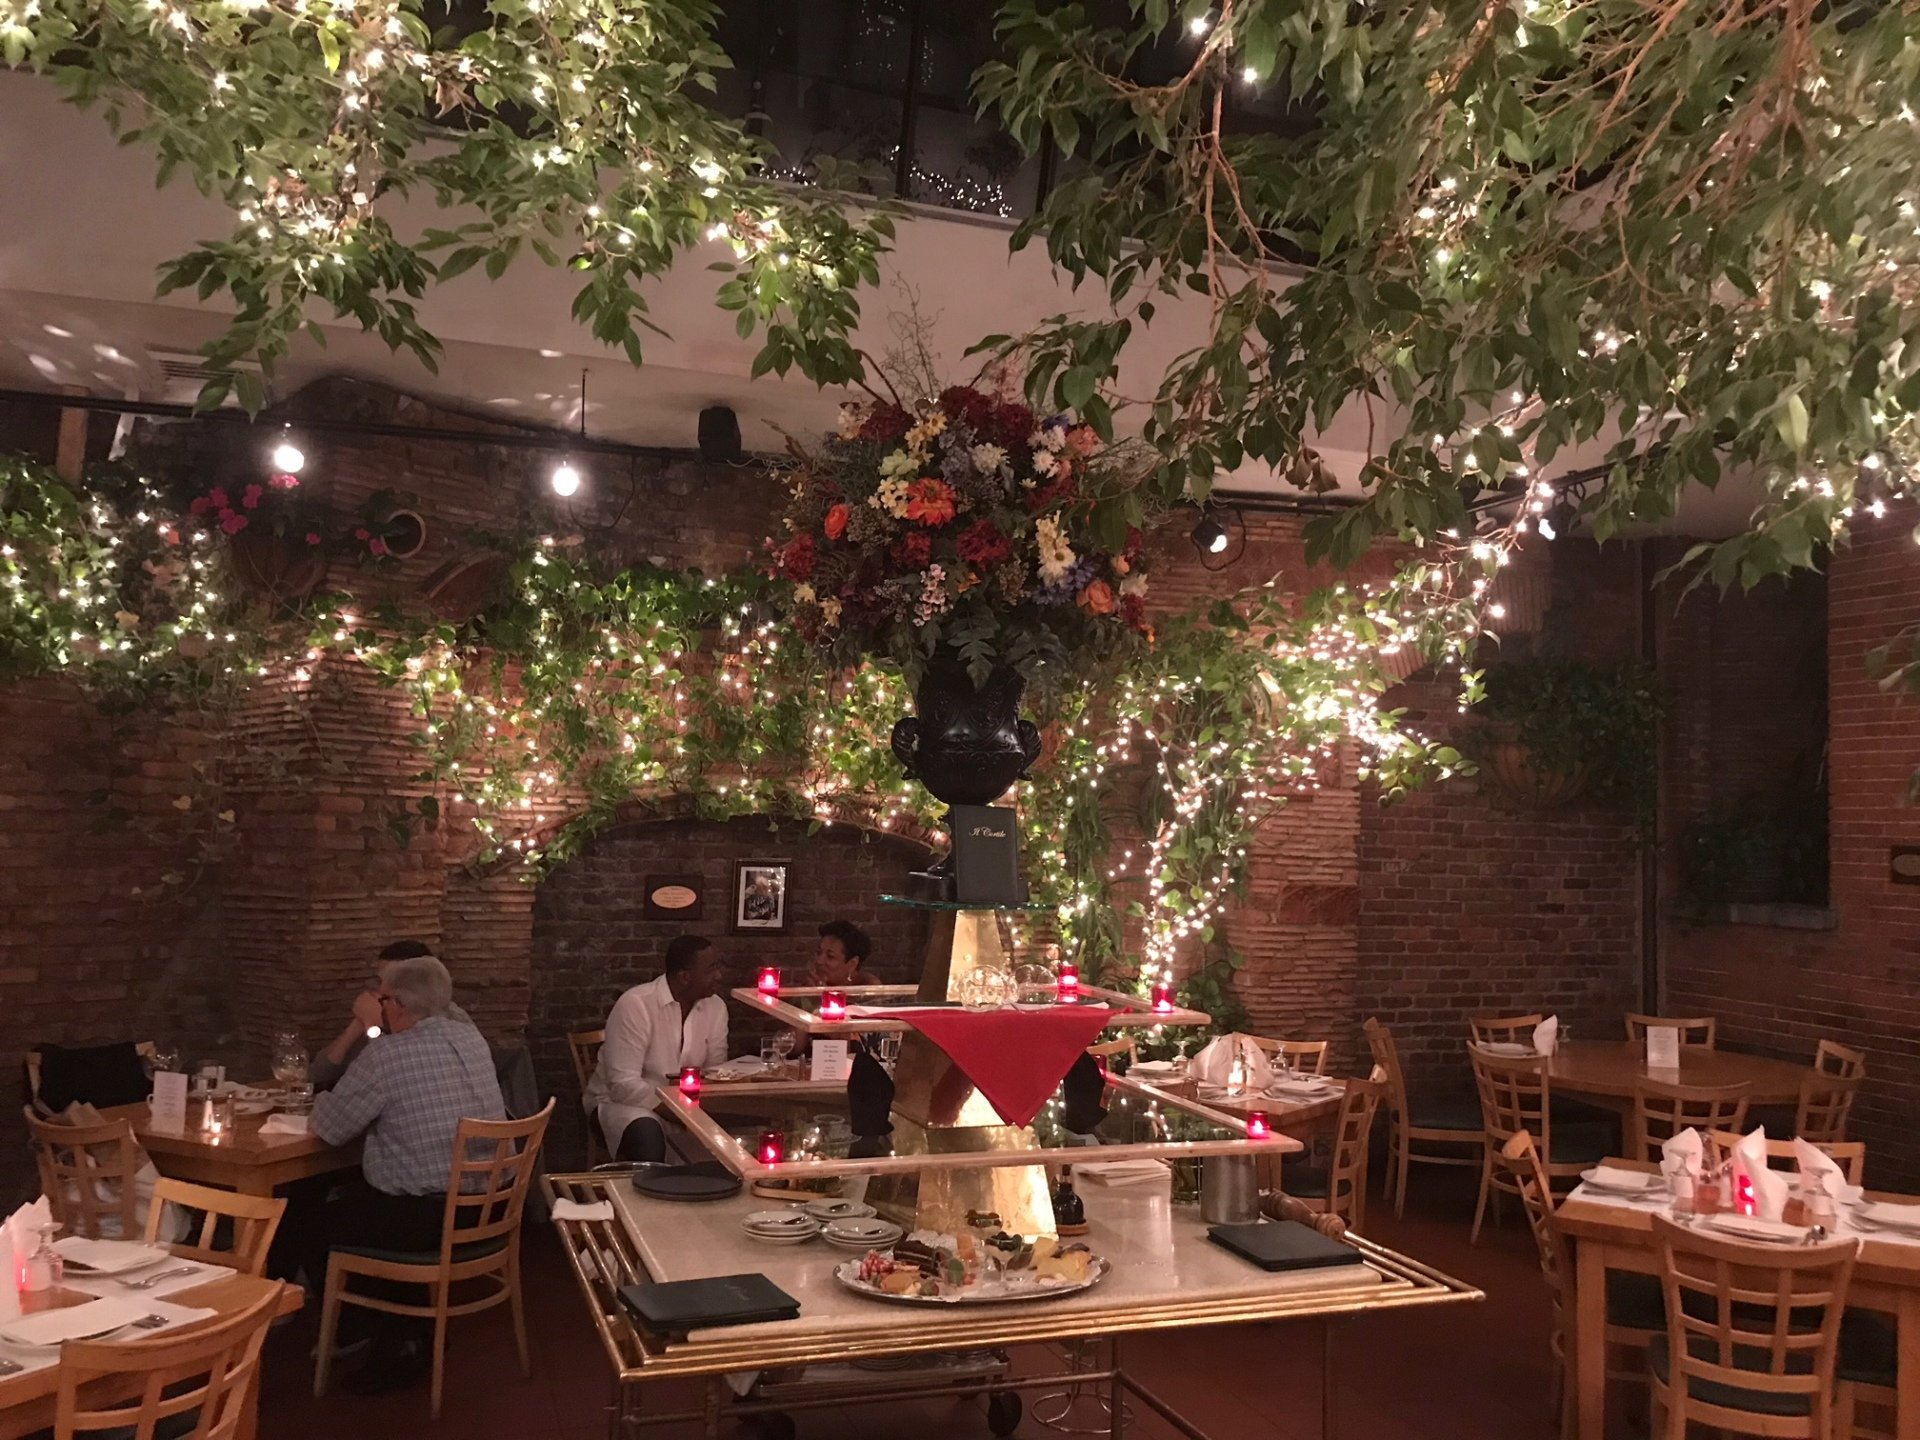 Italian Restaurant - New York, NY - Il Cortile Restaurant